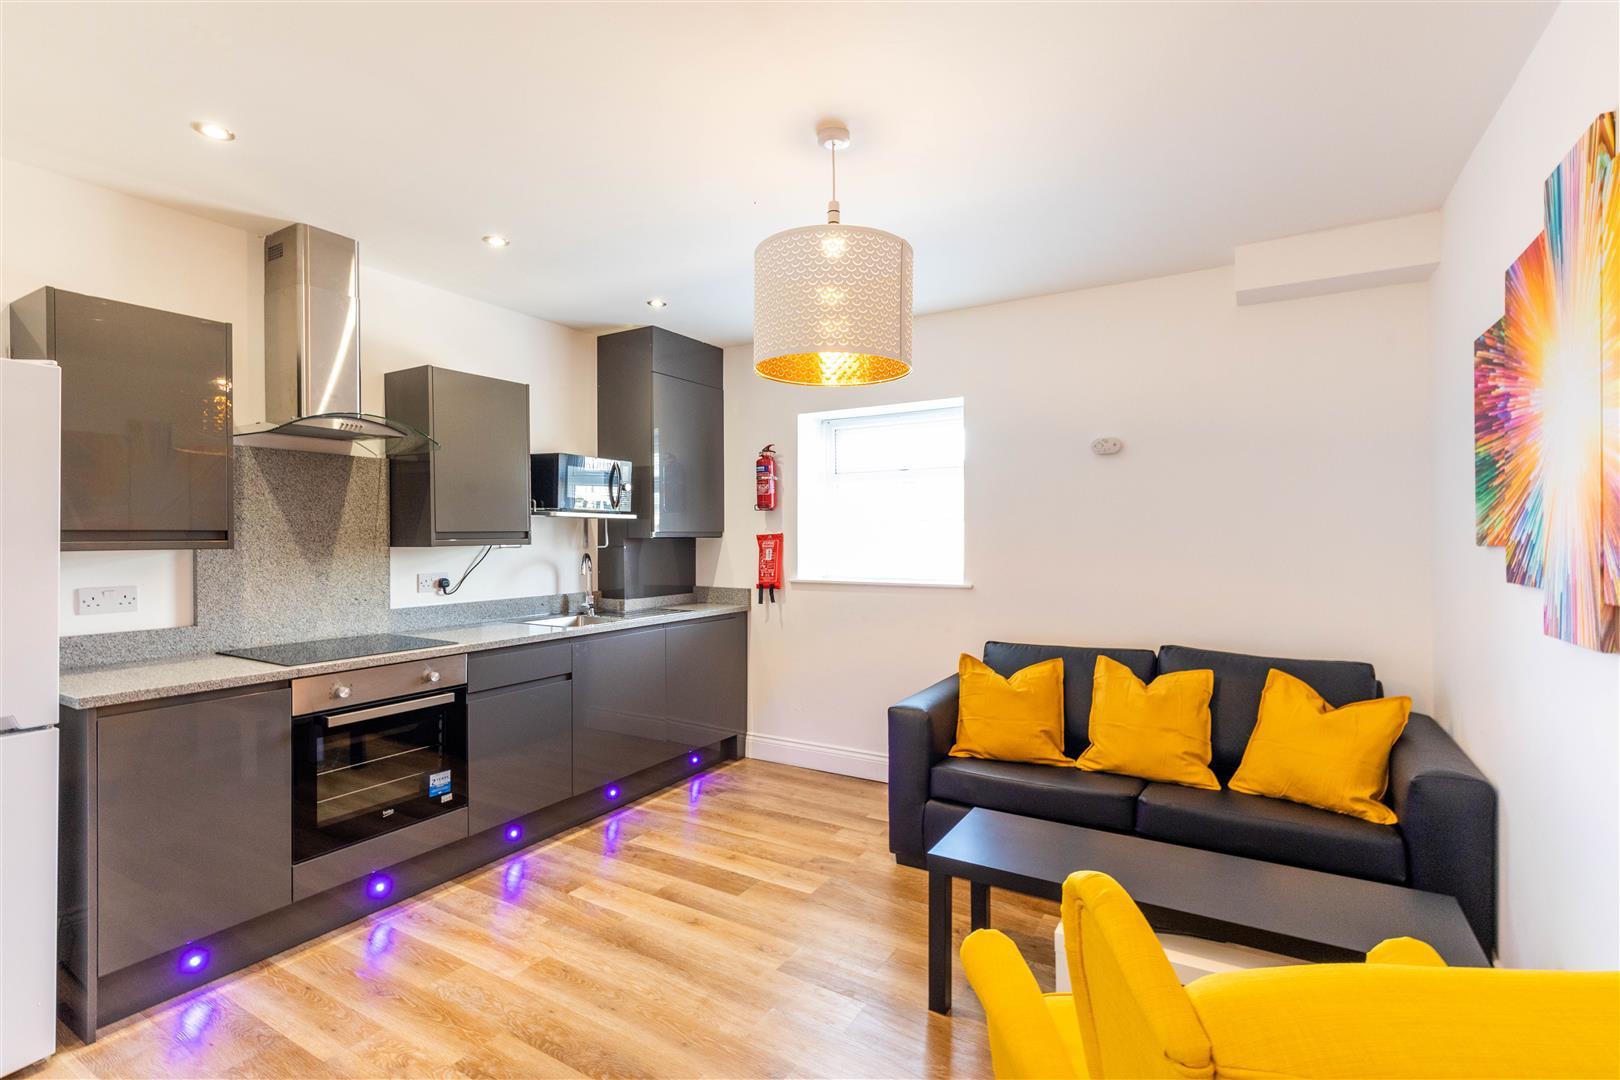 3 bed apartment to rent in Newcastle Upon Tyne, NE1 8JN, NE1